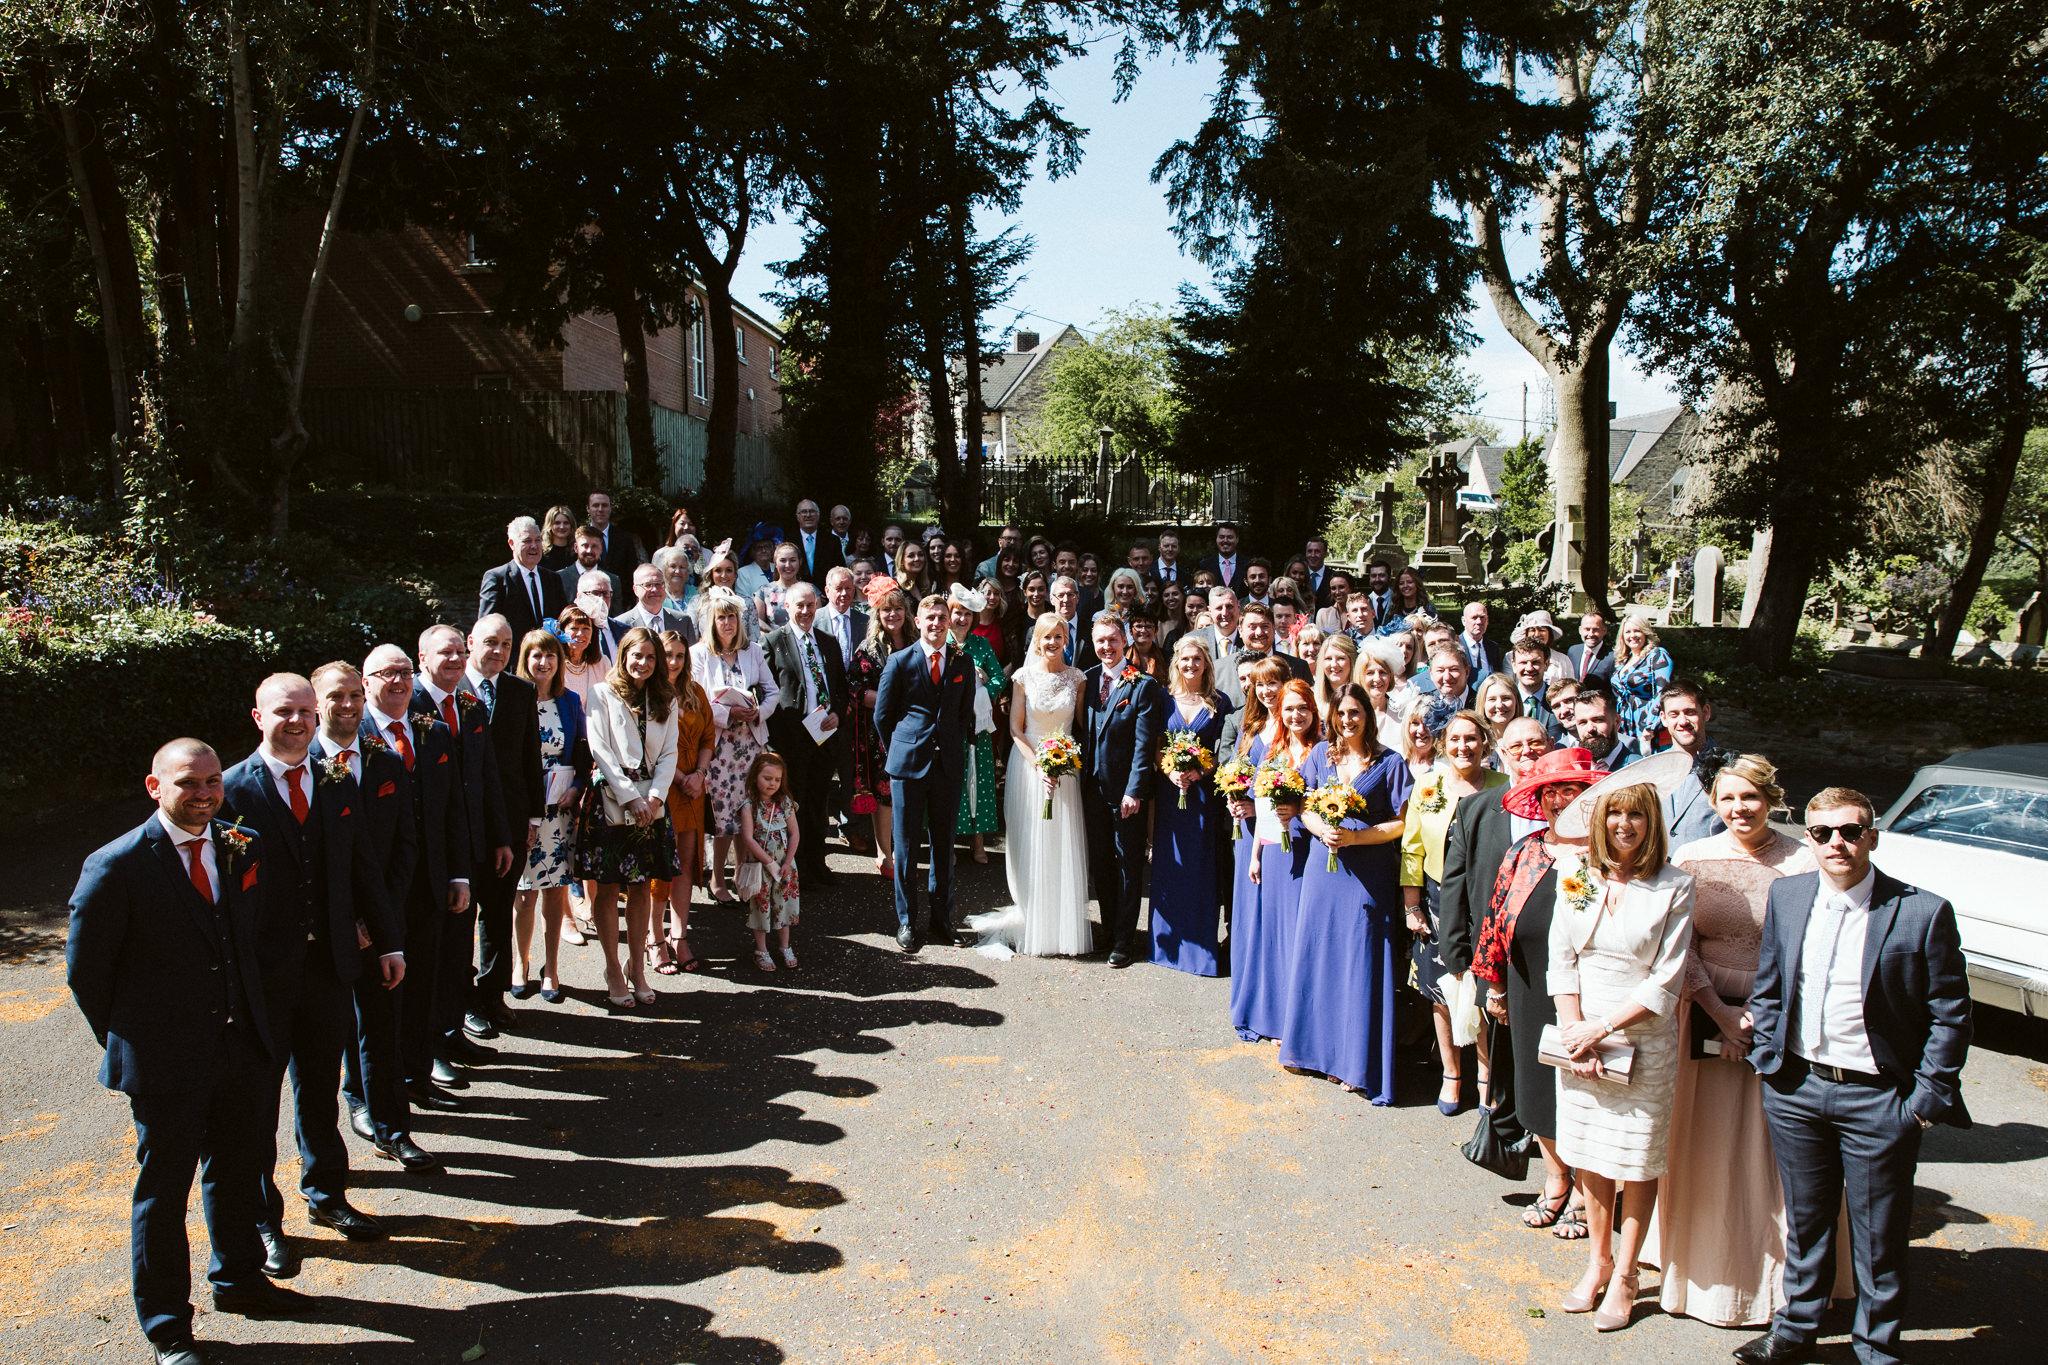 northside-farm-wedding-northumberland-margarita-hope (35).jpg